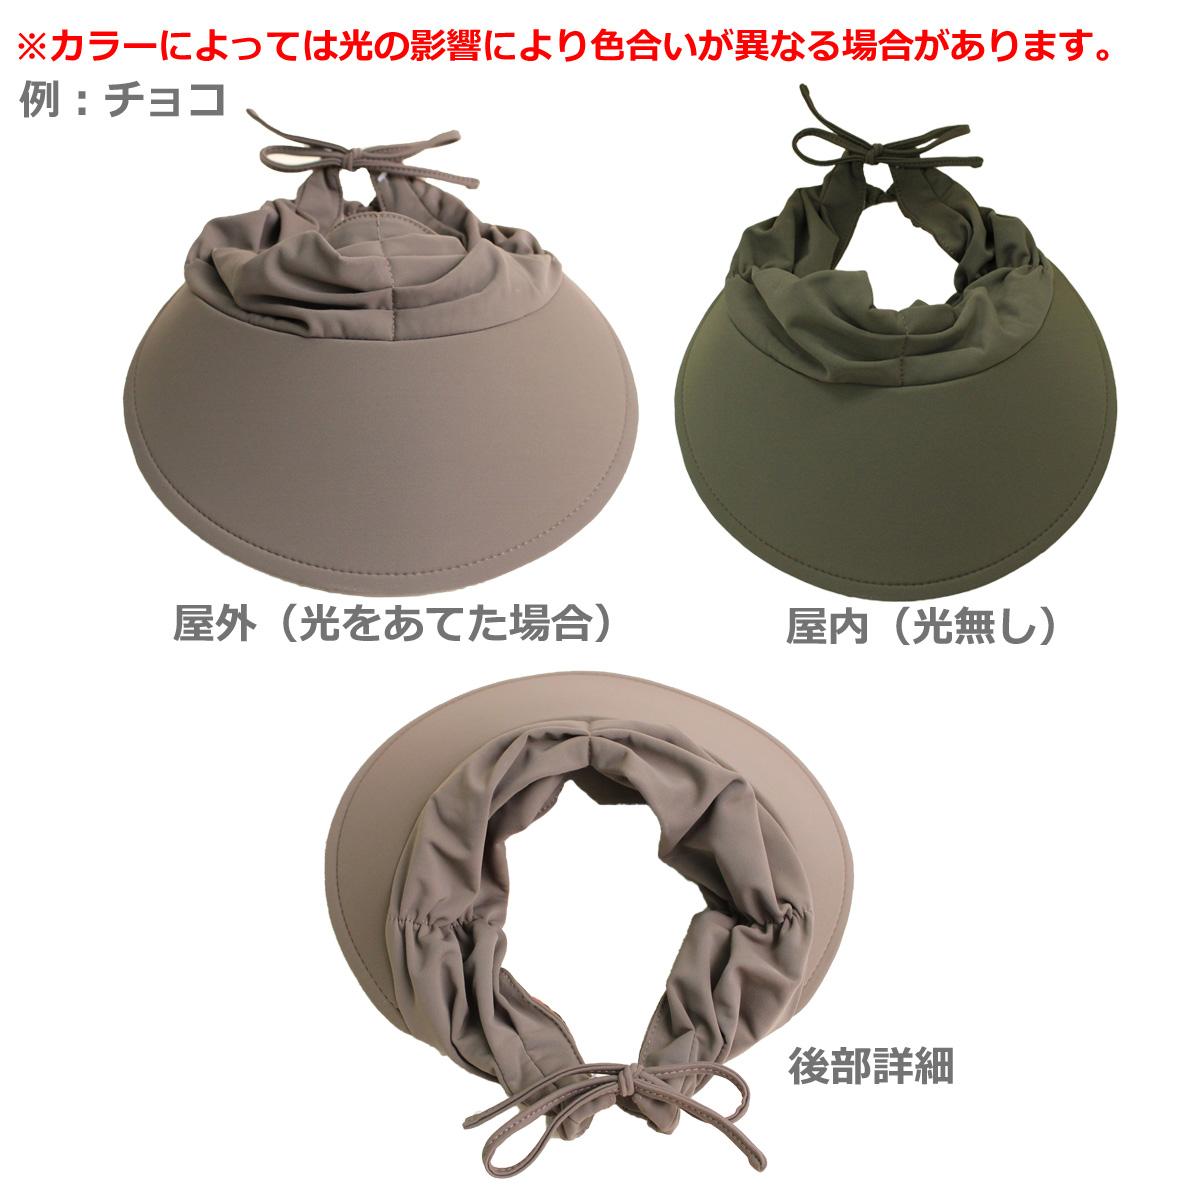 22f11e2573a5c5 ... Sun hat - Ladies visor - Lycra Adjustable Visor - Chocolate UPF50+  EXCELLENT PROTECTION which blocks ...